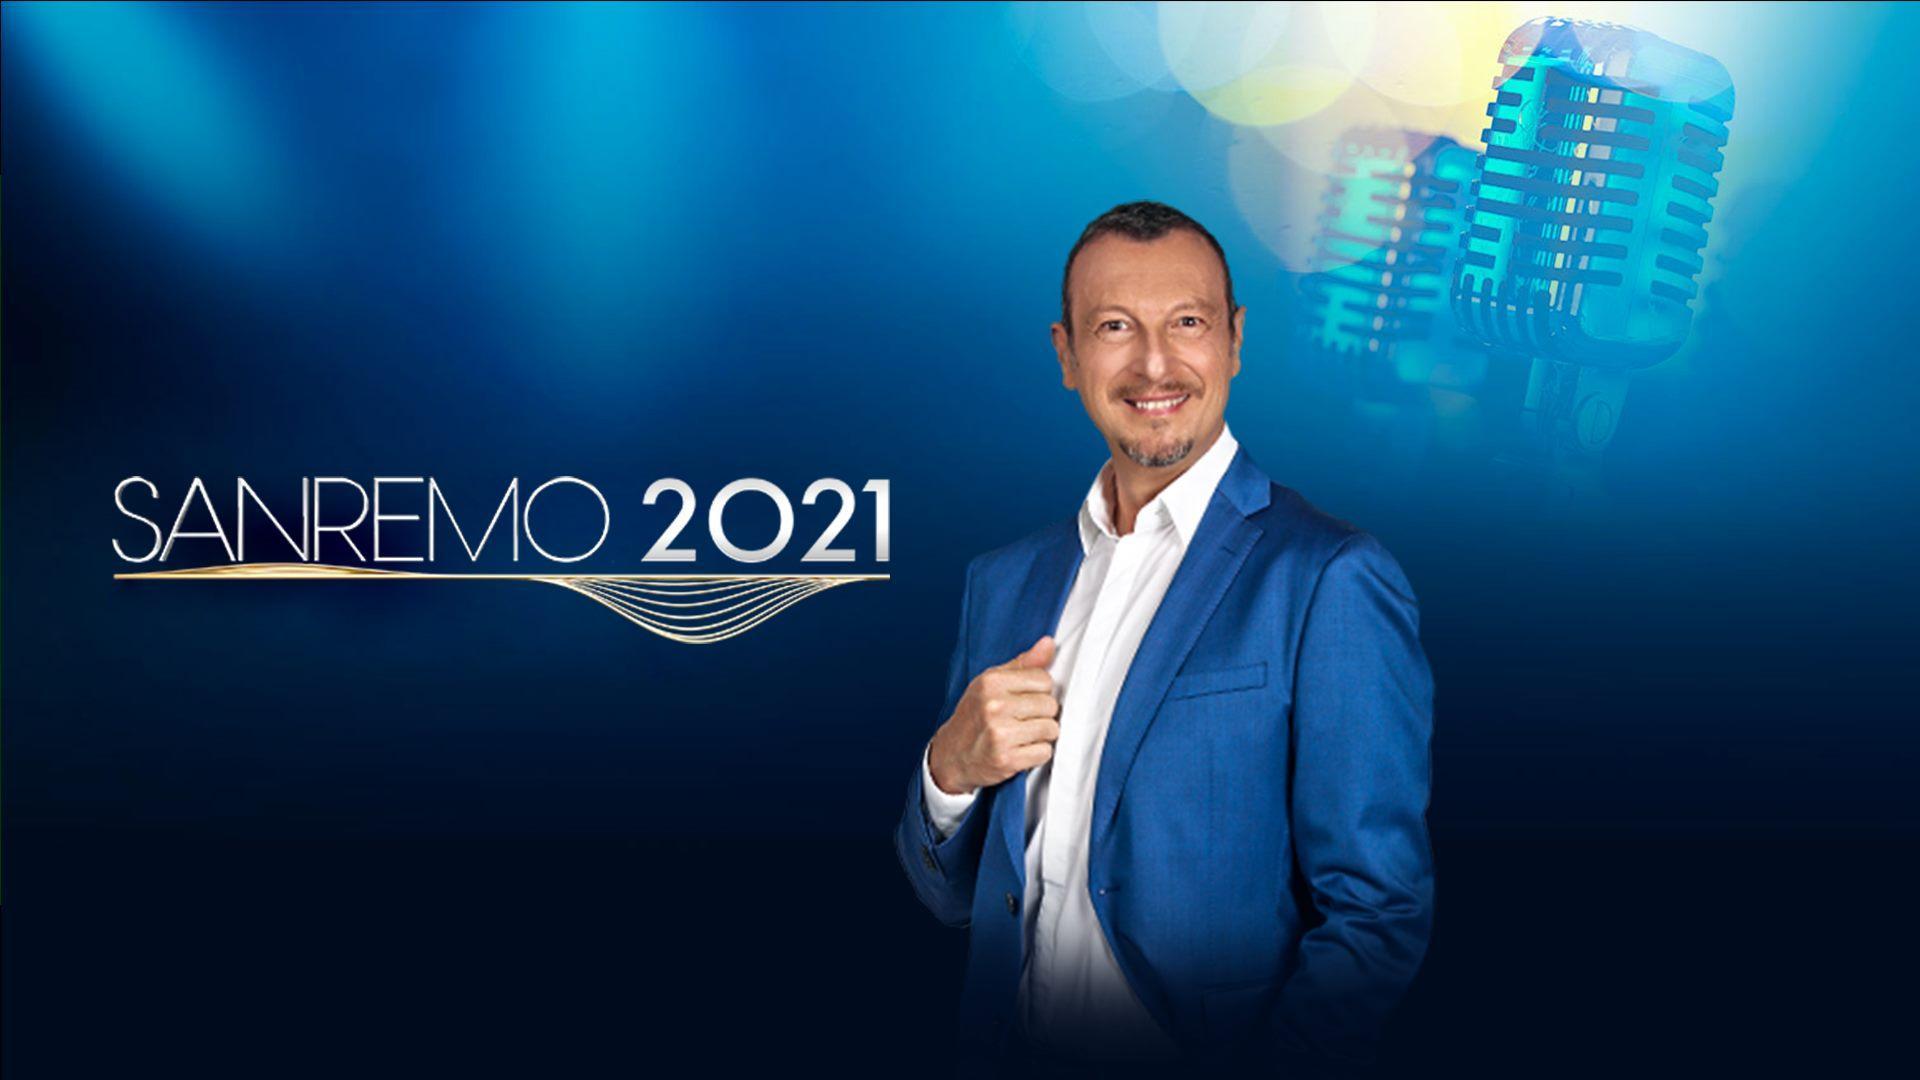 Sanremo 2021 pubblico